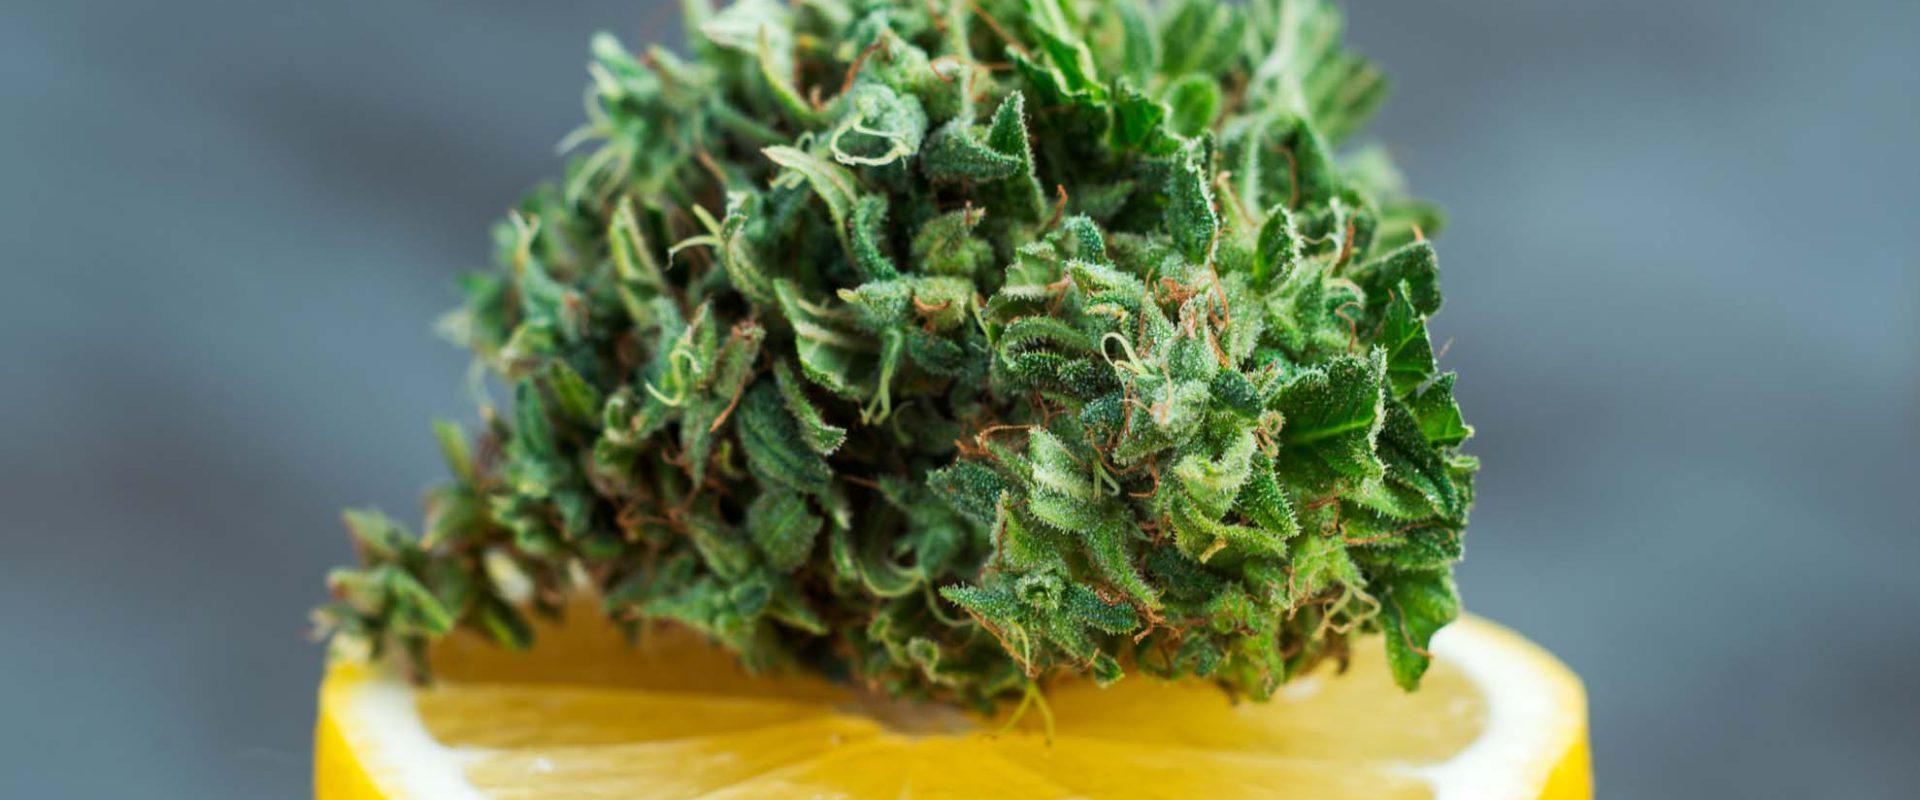 cannabis flower over lemon